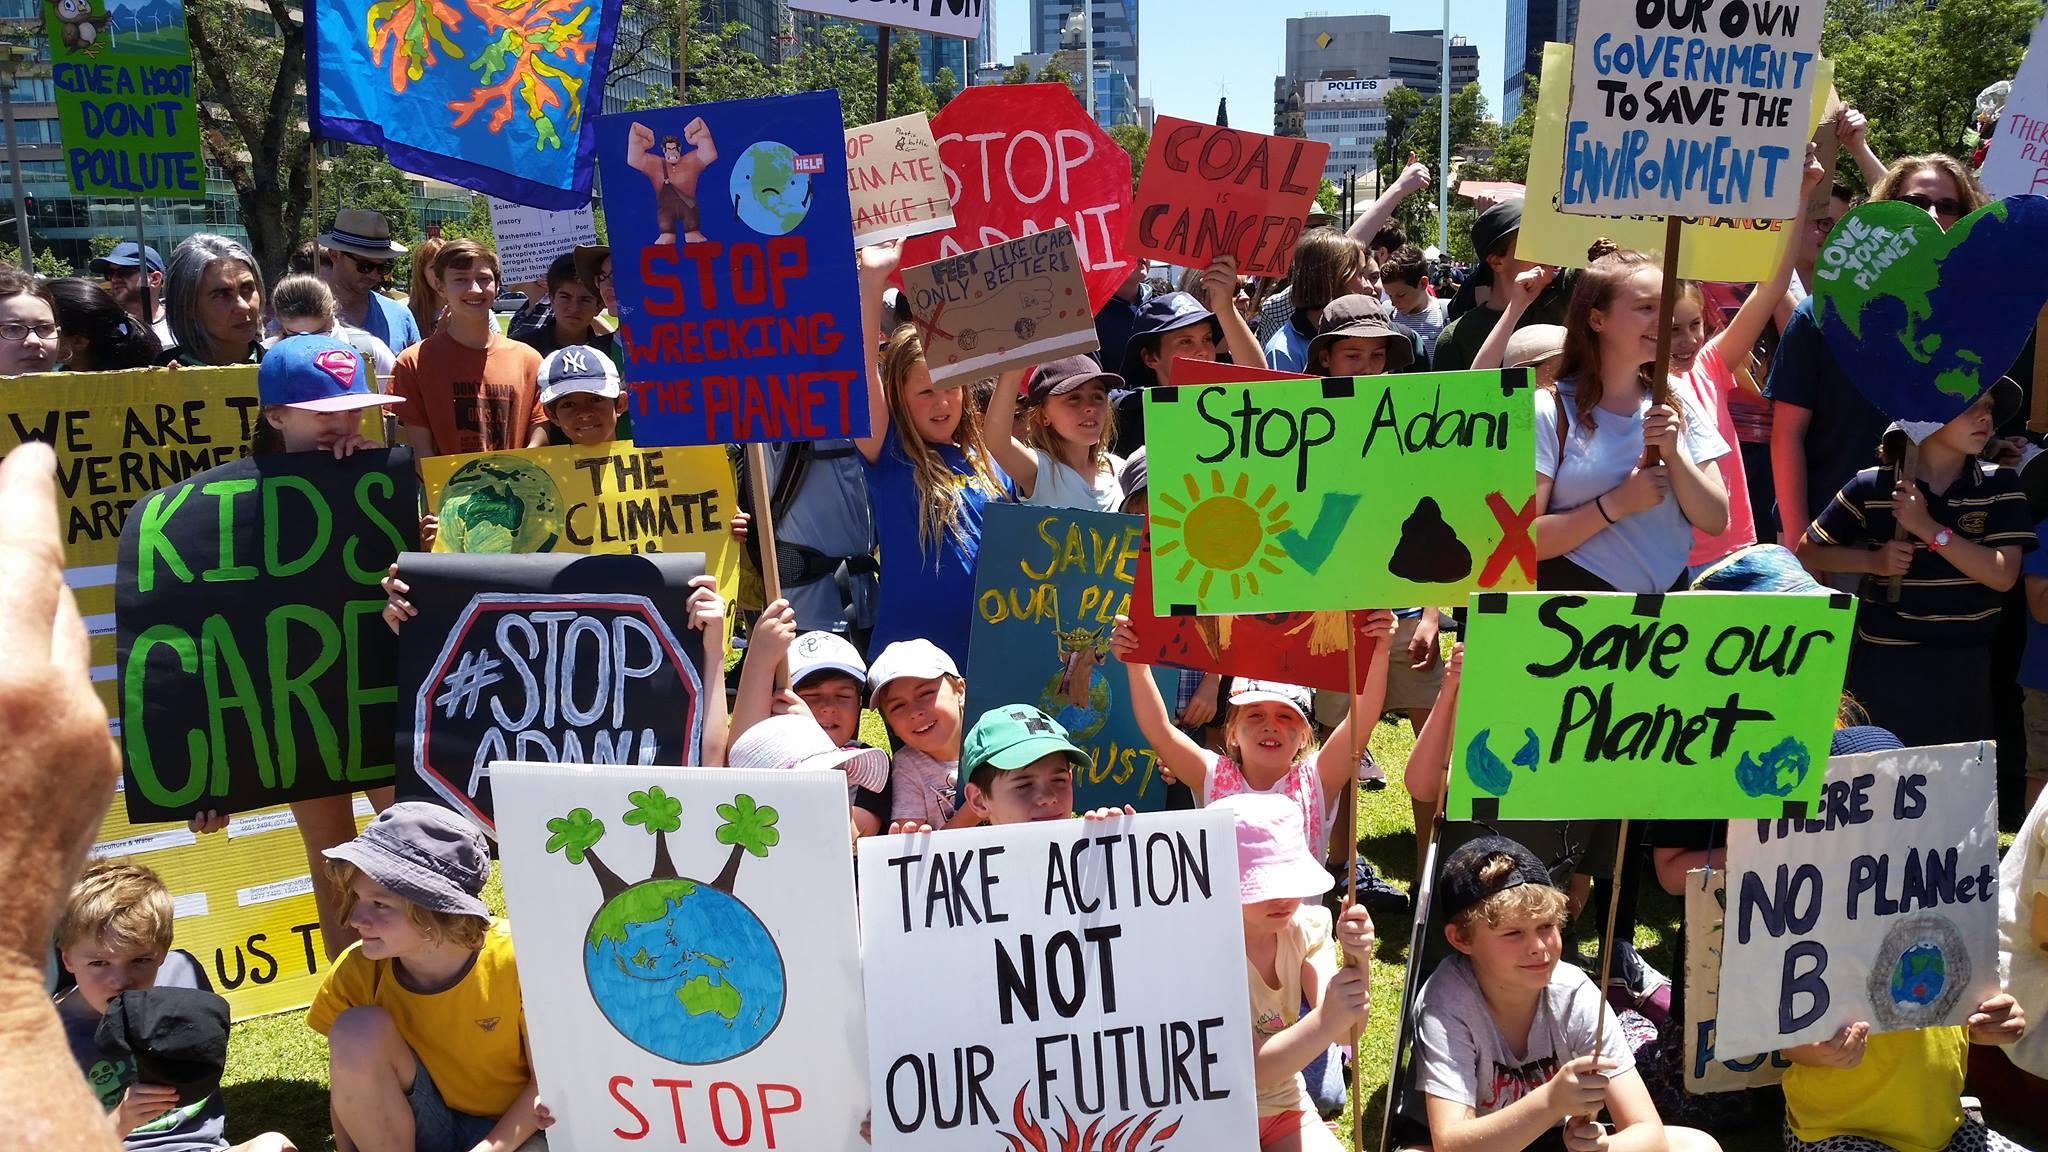 strike-for-climate-change.jpg